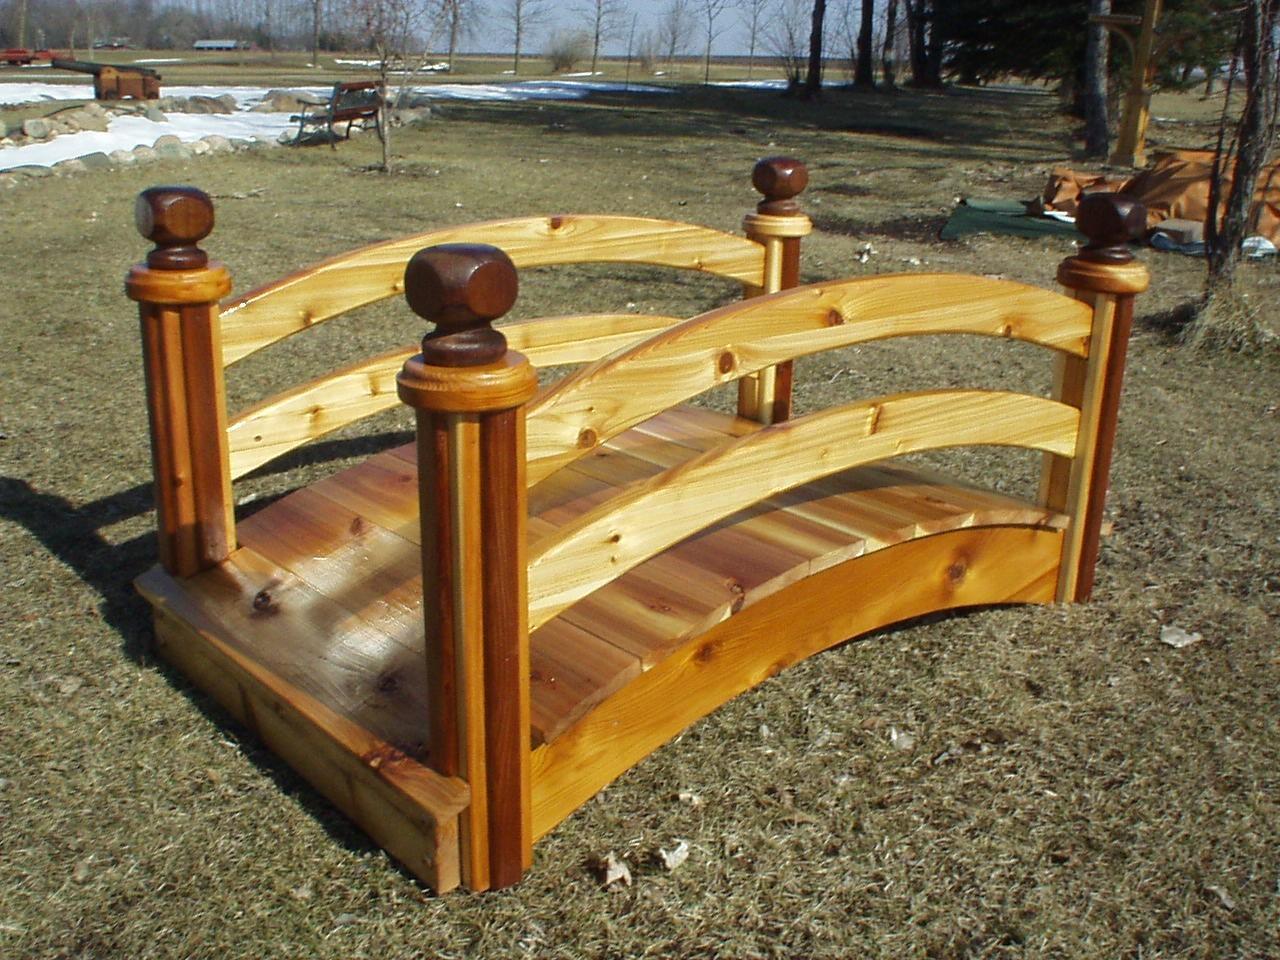 We Have 22 Different Designes Of Elegant Wooden Garden And Pond Bridges To  Choose From. We Also Provide Landscape Garden Bridge Plans, Repair Bridges  And ...